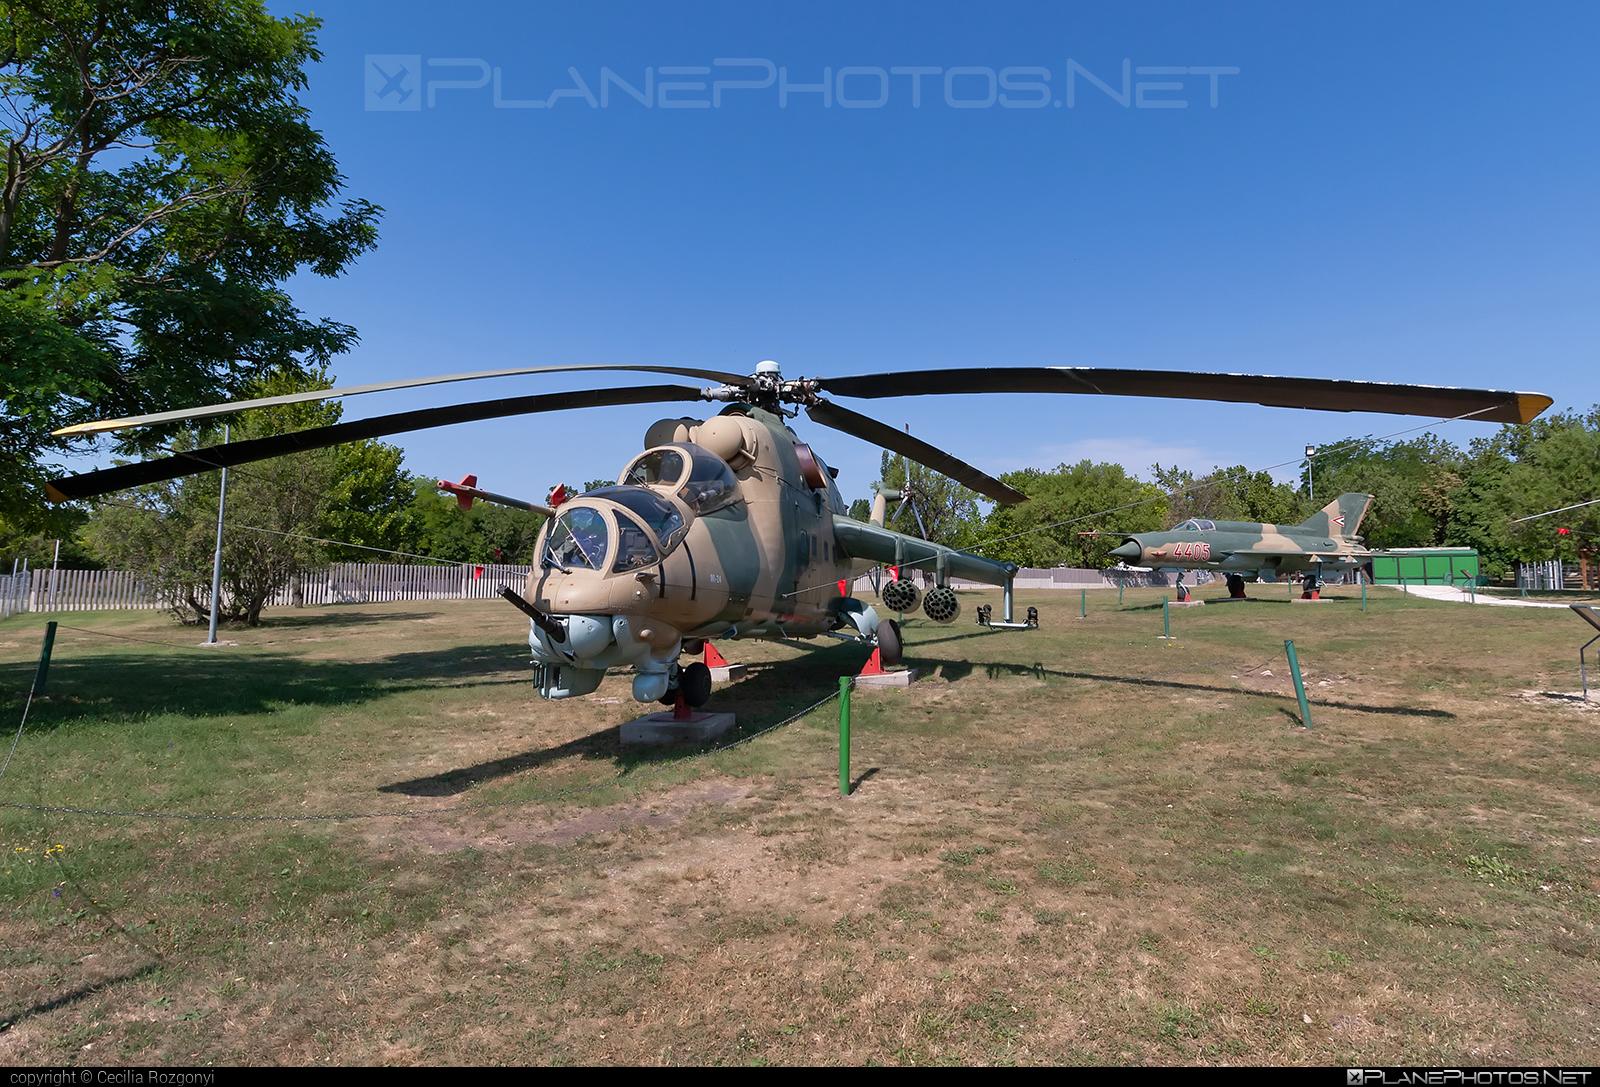 Mil Mi-24D - 168 operated by Magyar Légierő (Hungarian Air Force) #hungarianairforce #magyarlegiero #mi24 #mi24d #mil #mil24 #mil24d #milhelicopters